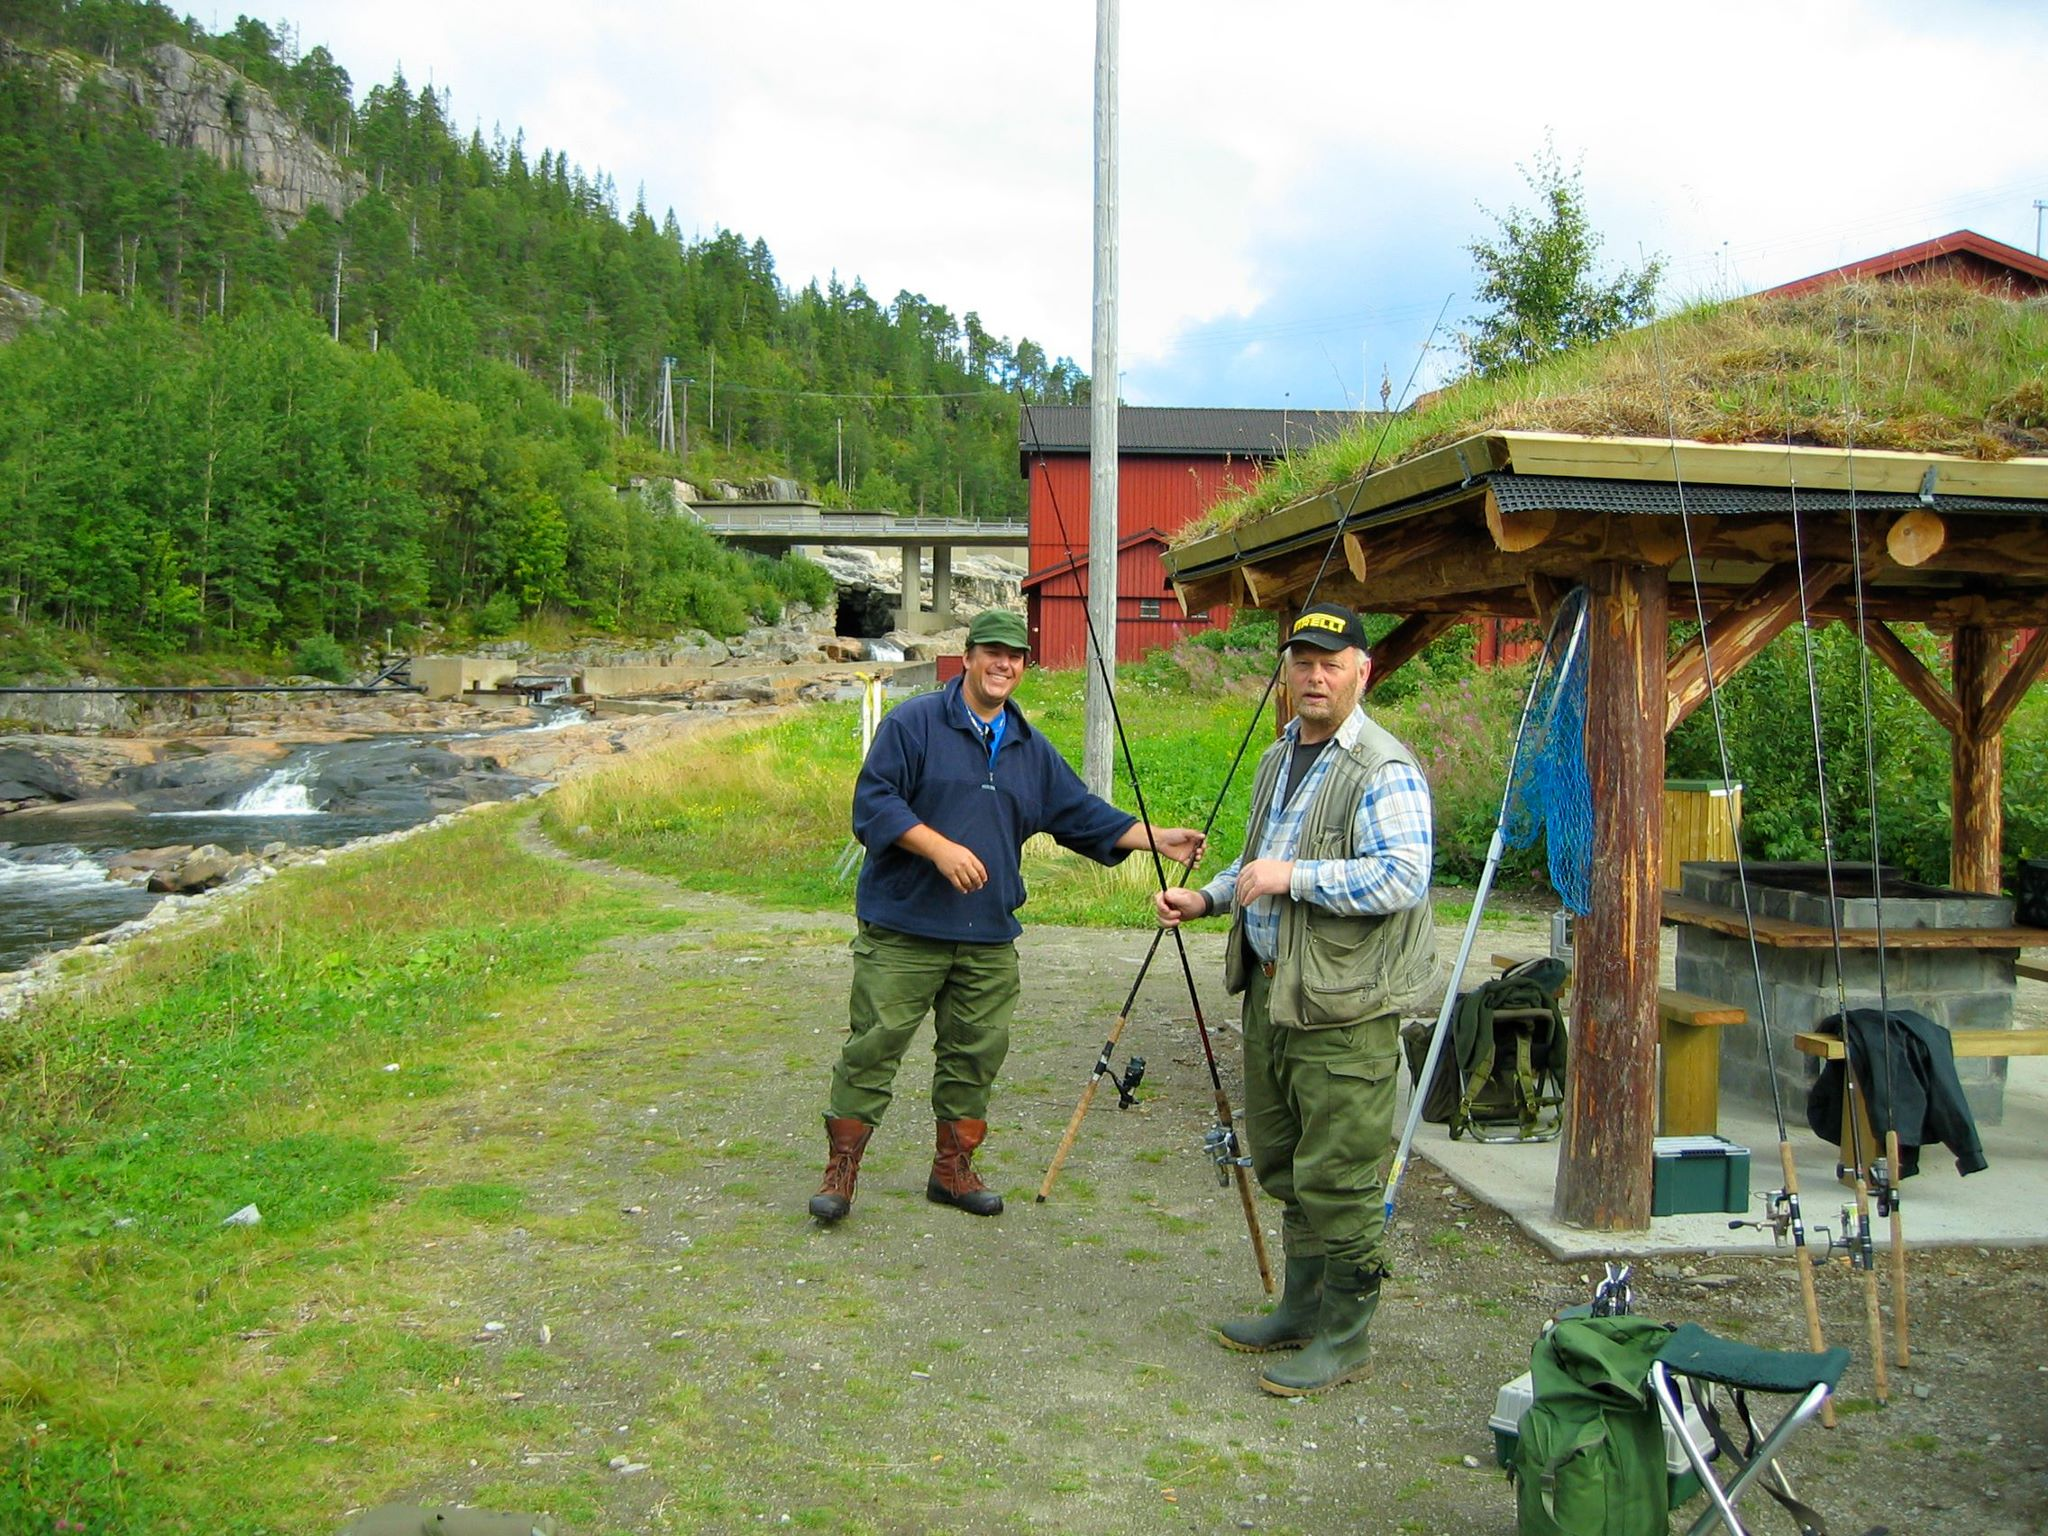 Laksefiskere i Opløelva.